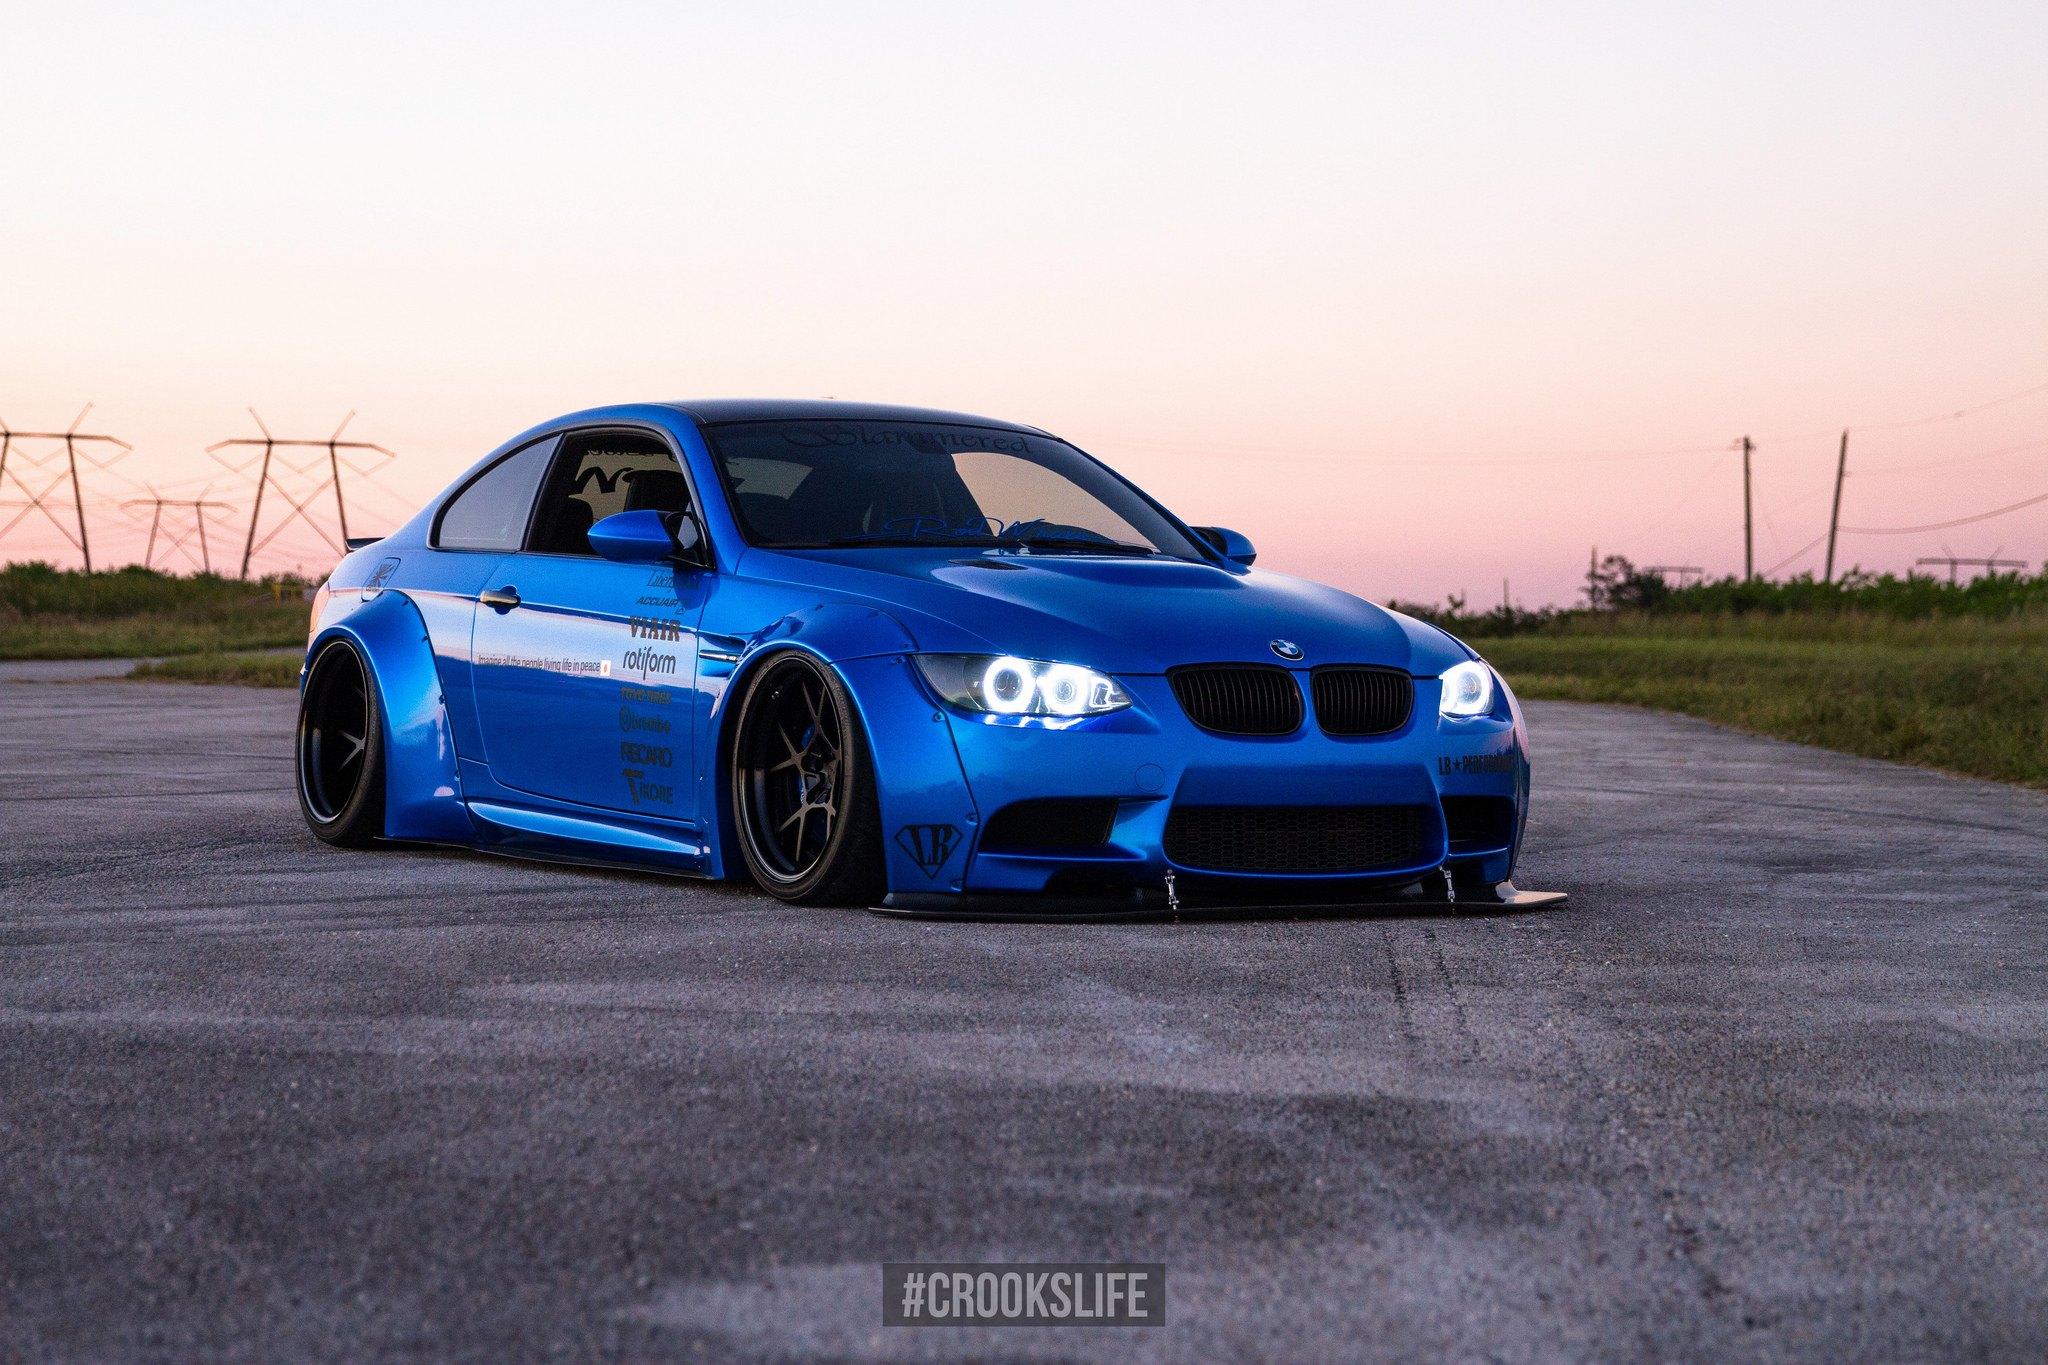 Royal Blue Stanced BMW Series CARiDcom Gallery - Blue bmw 3 series